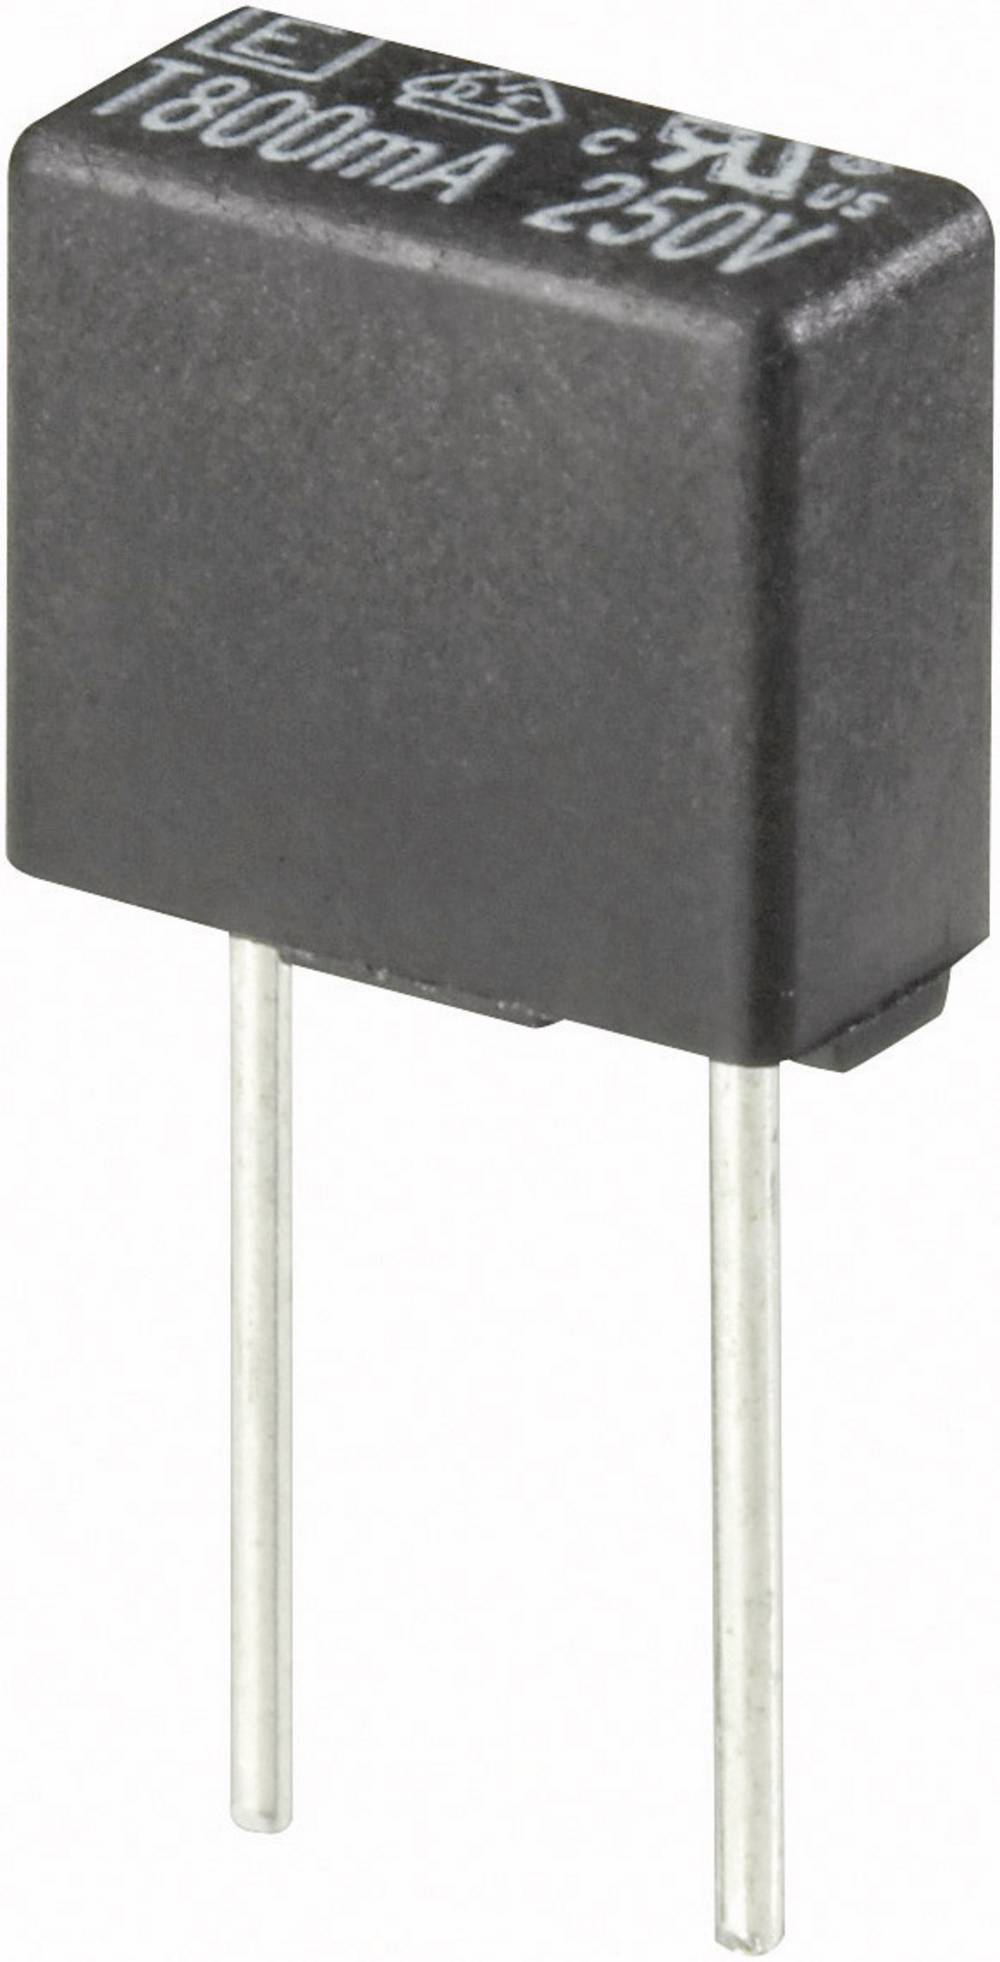 Mikrosikring ESKA 883010G 200 mA 250 V kantet Træg -T- med radial tråd 1000 stk